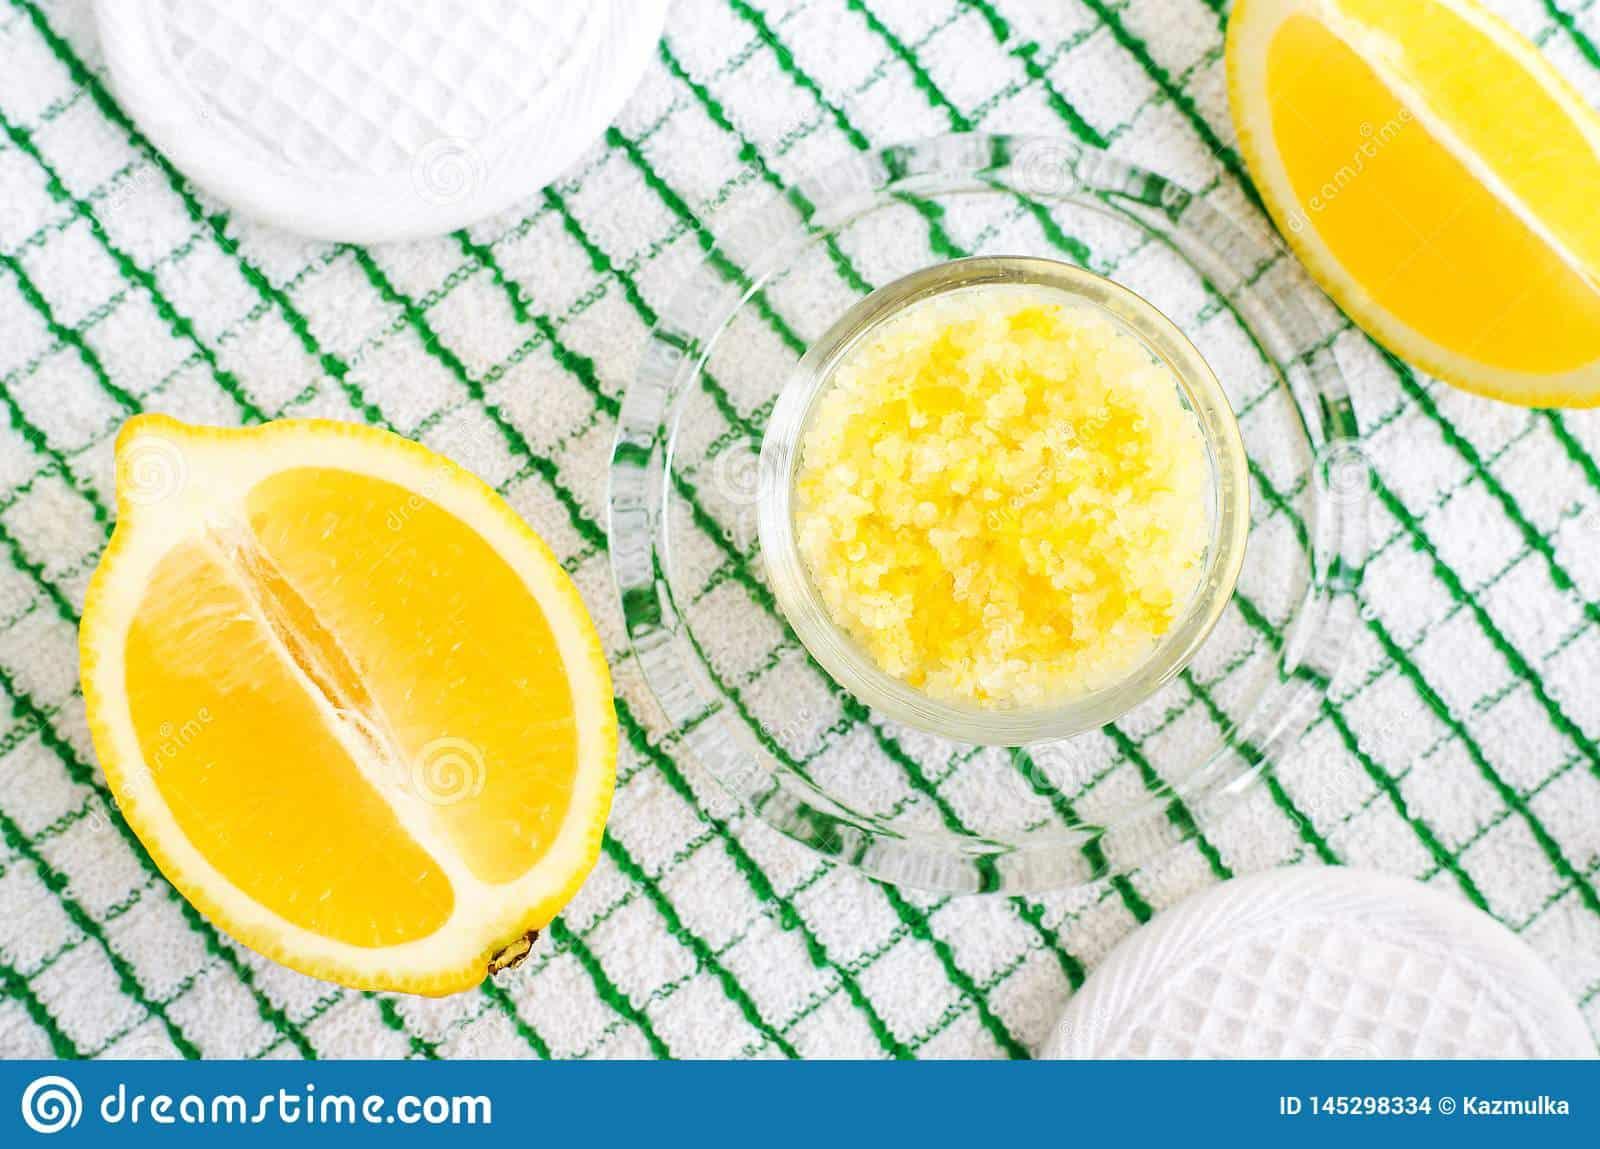 Homemade lemon foot soak